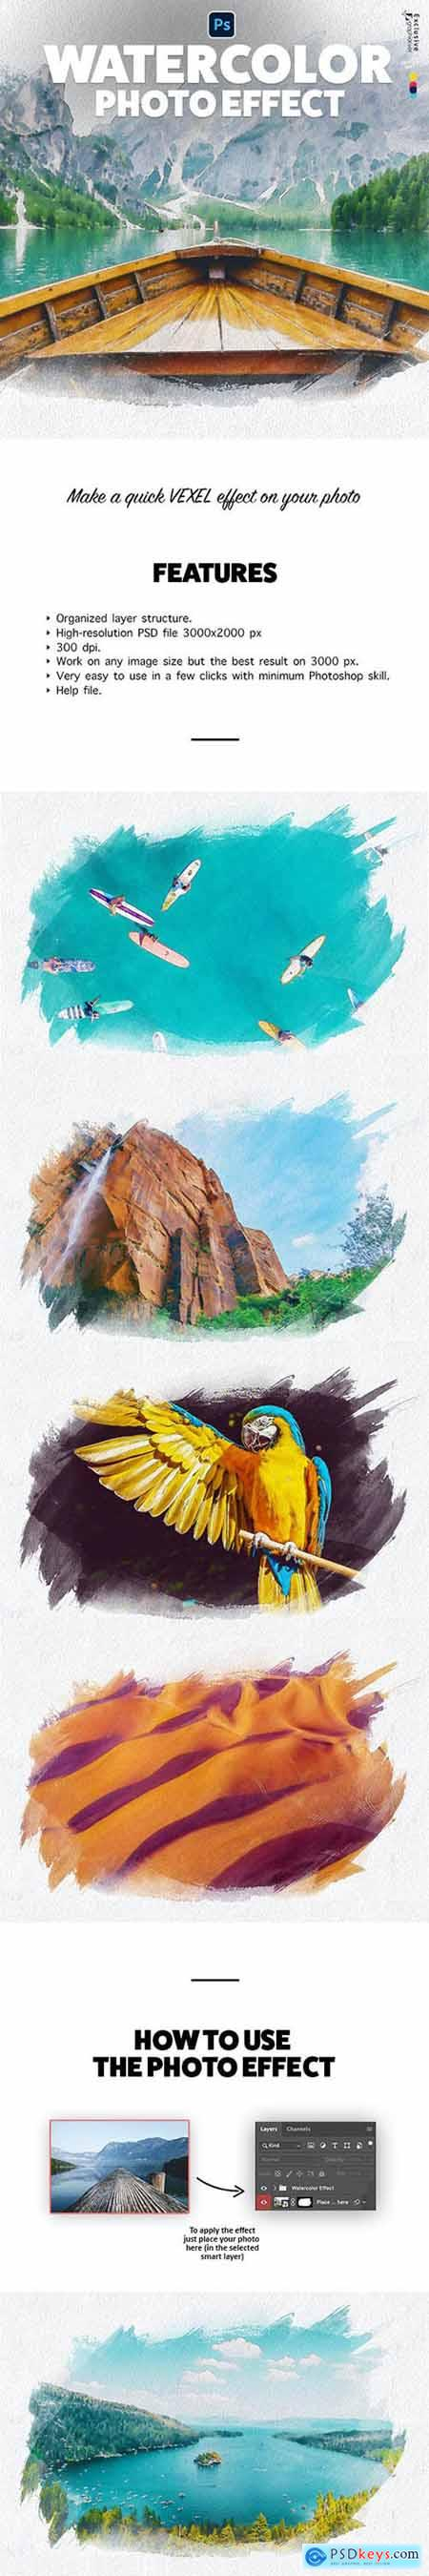 Watercolor Photo Effect 32788587